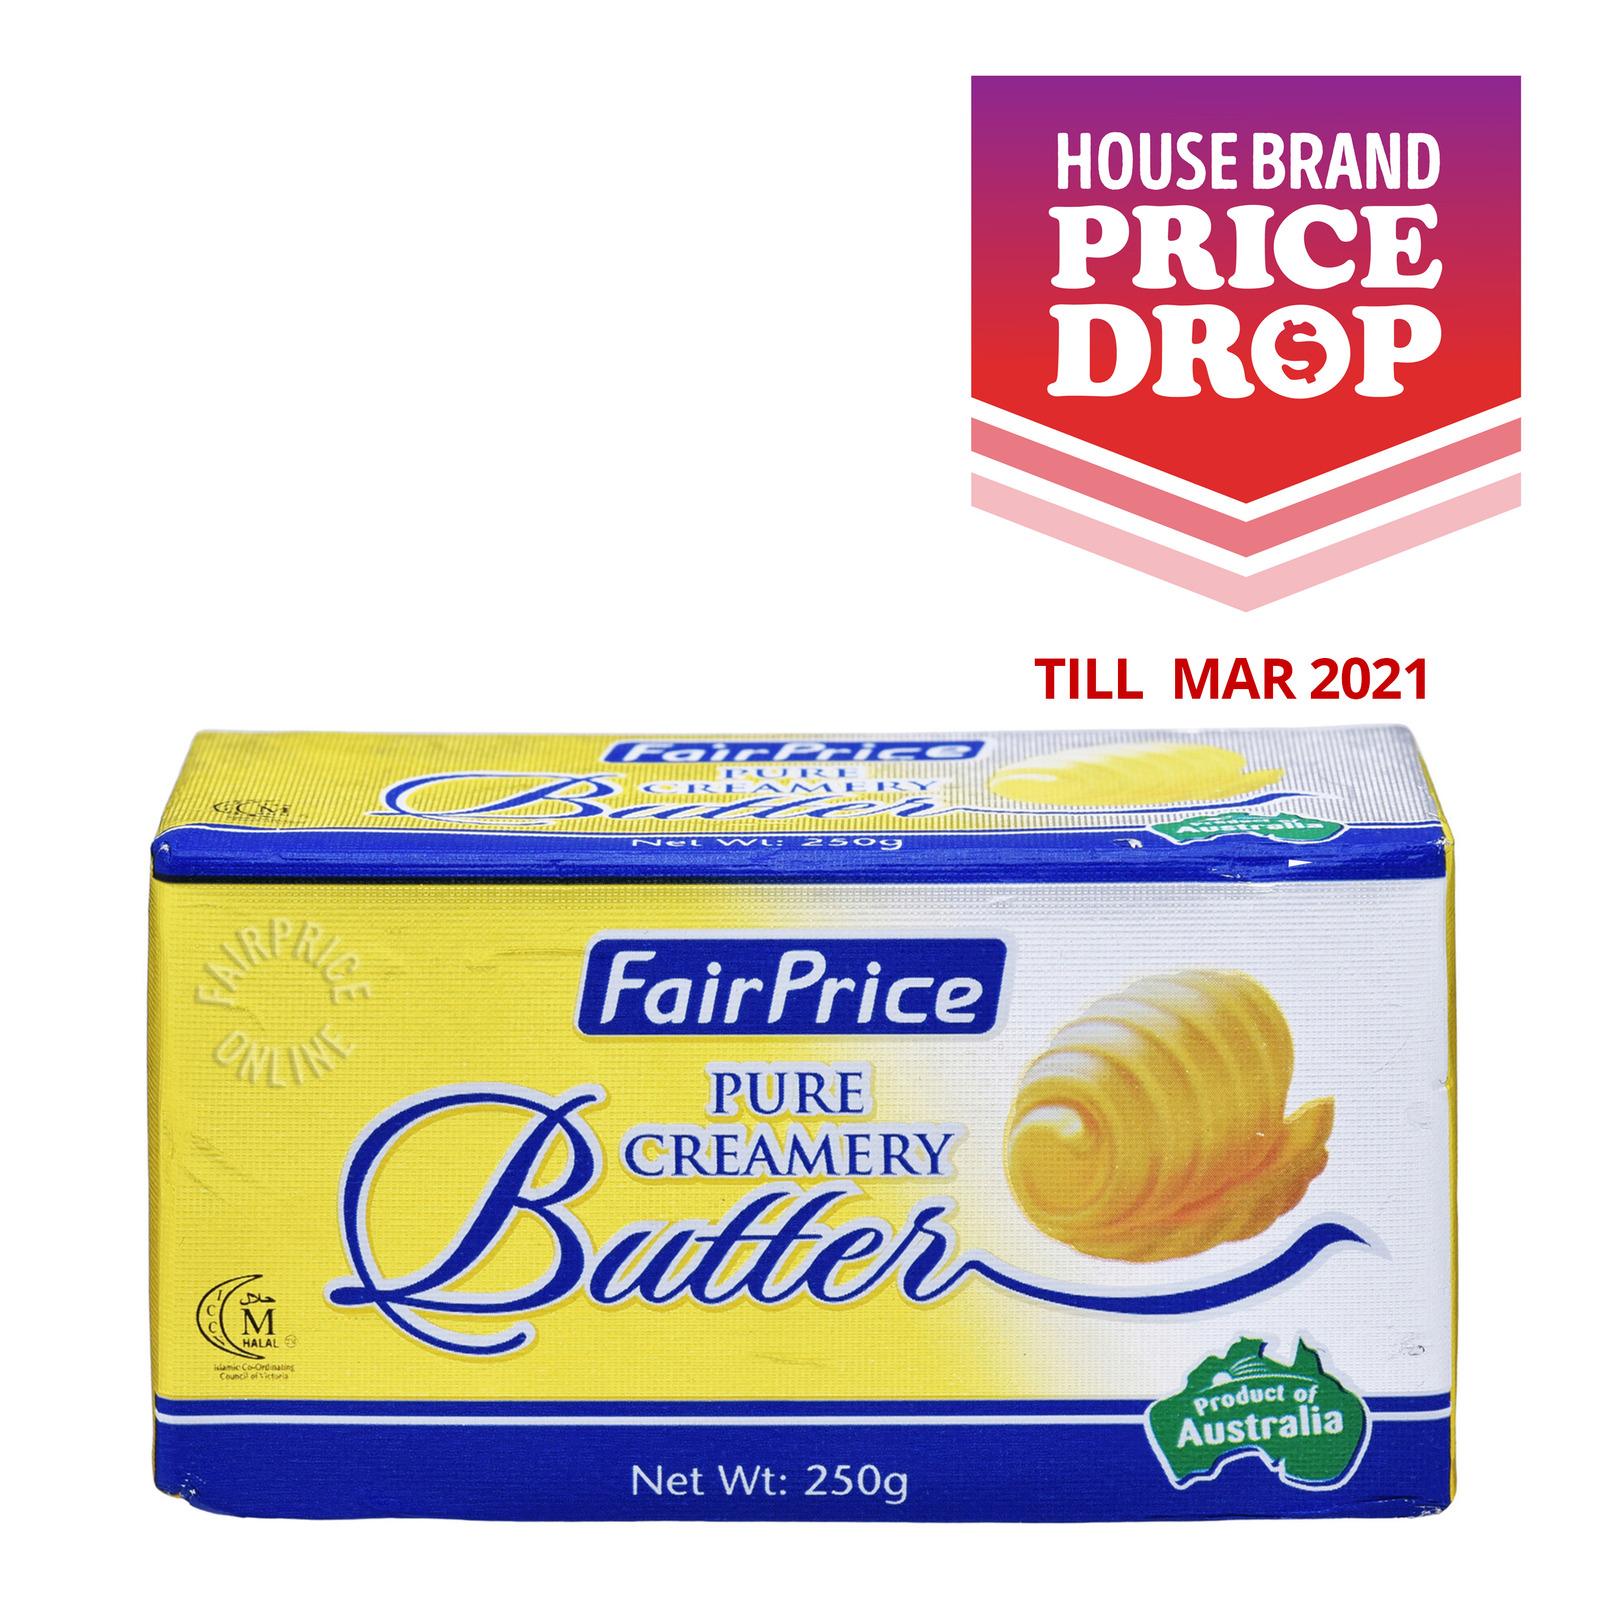 FairPrice Block Butter - Pure Creamery